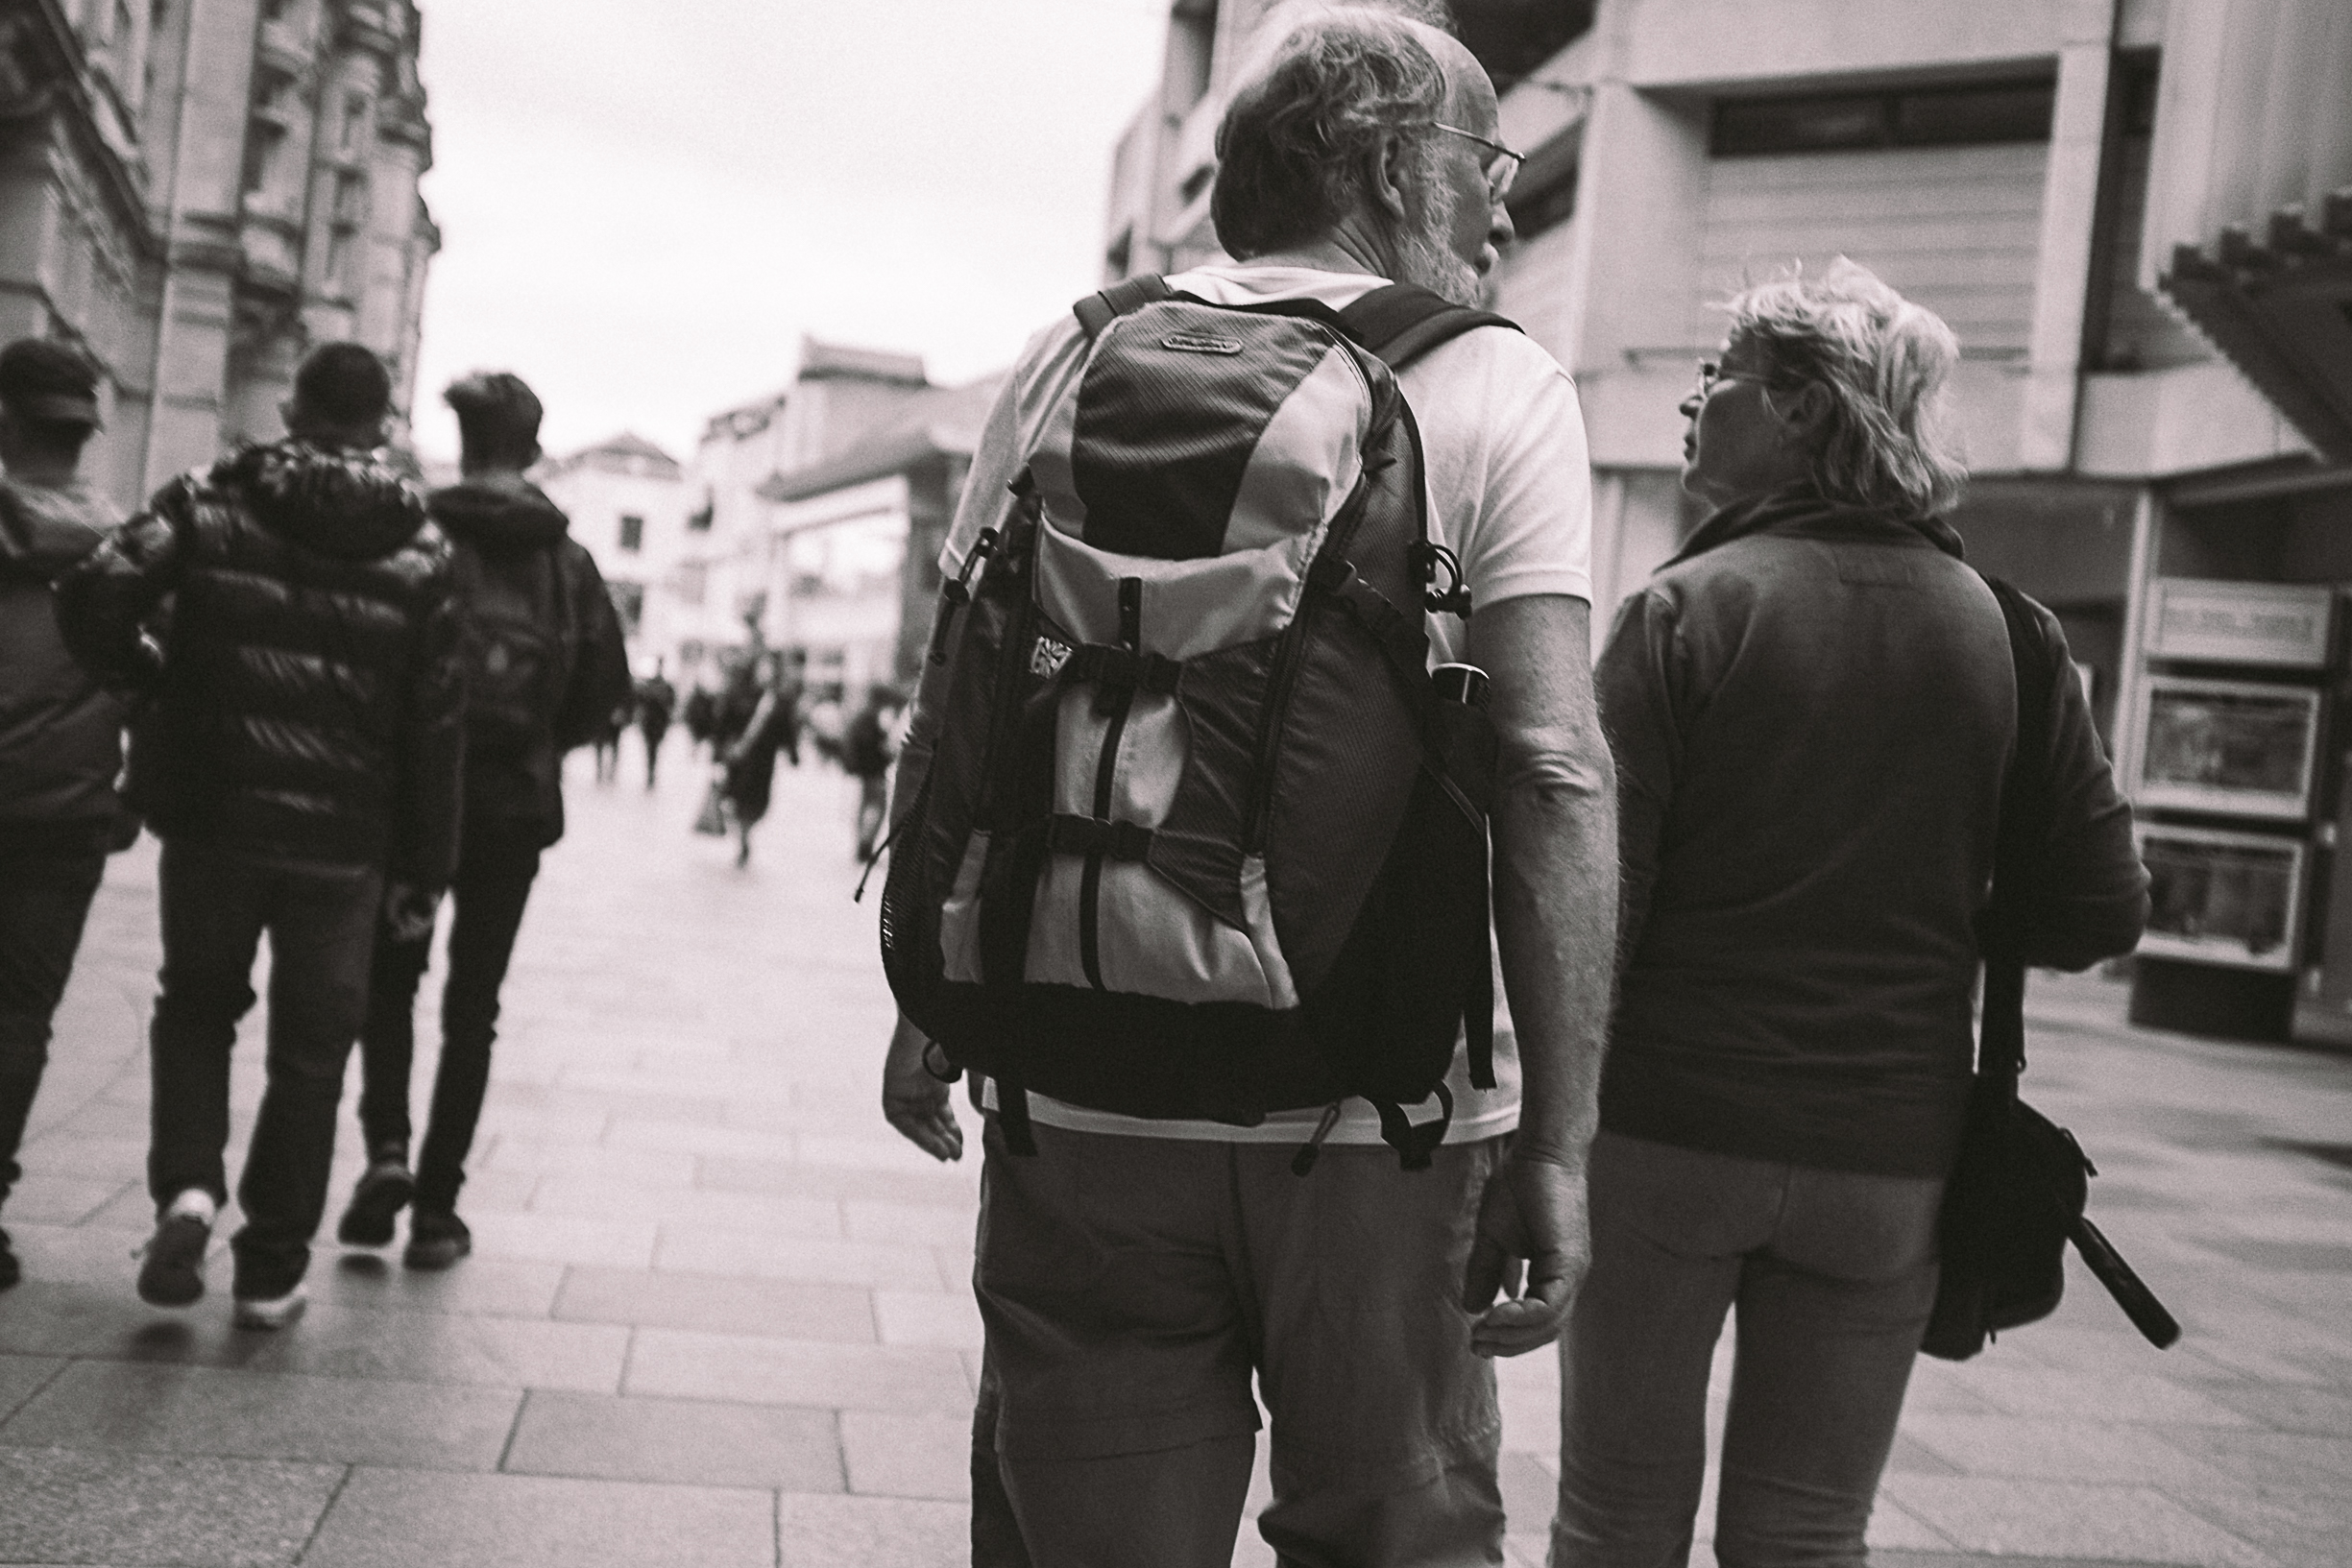 x100t street photography-5.jpg